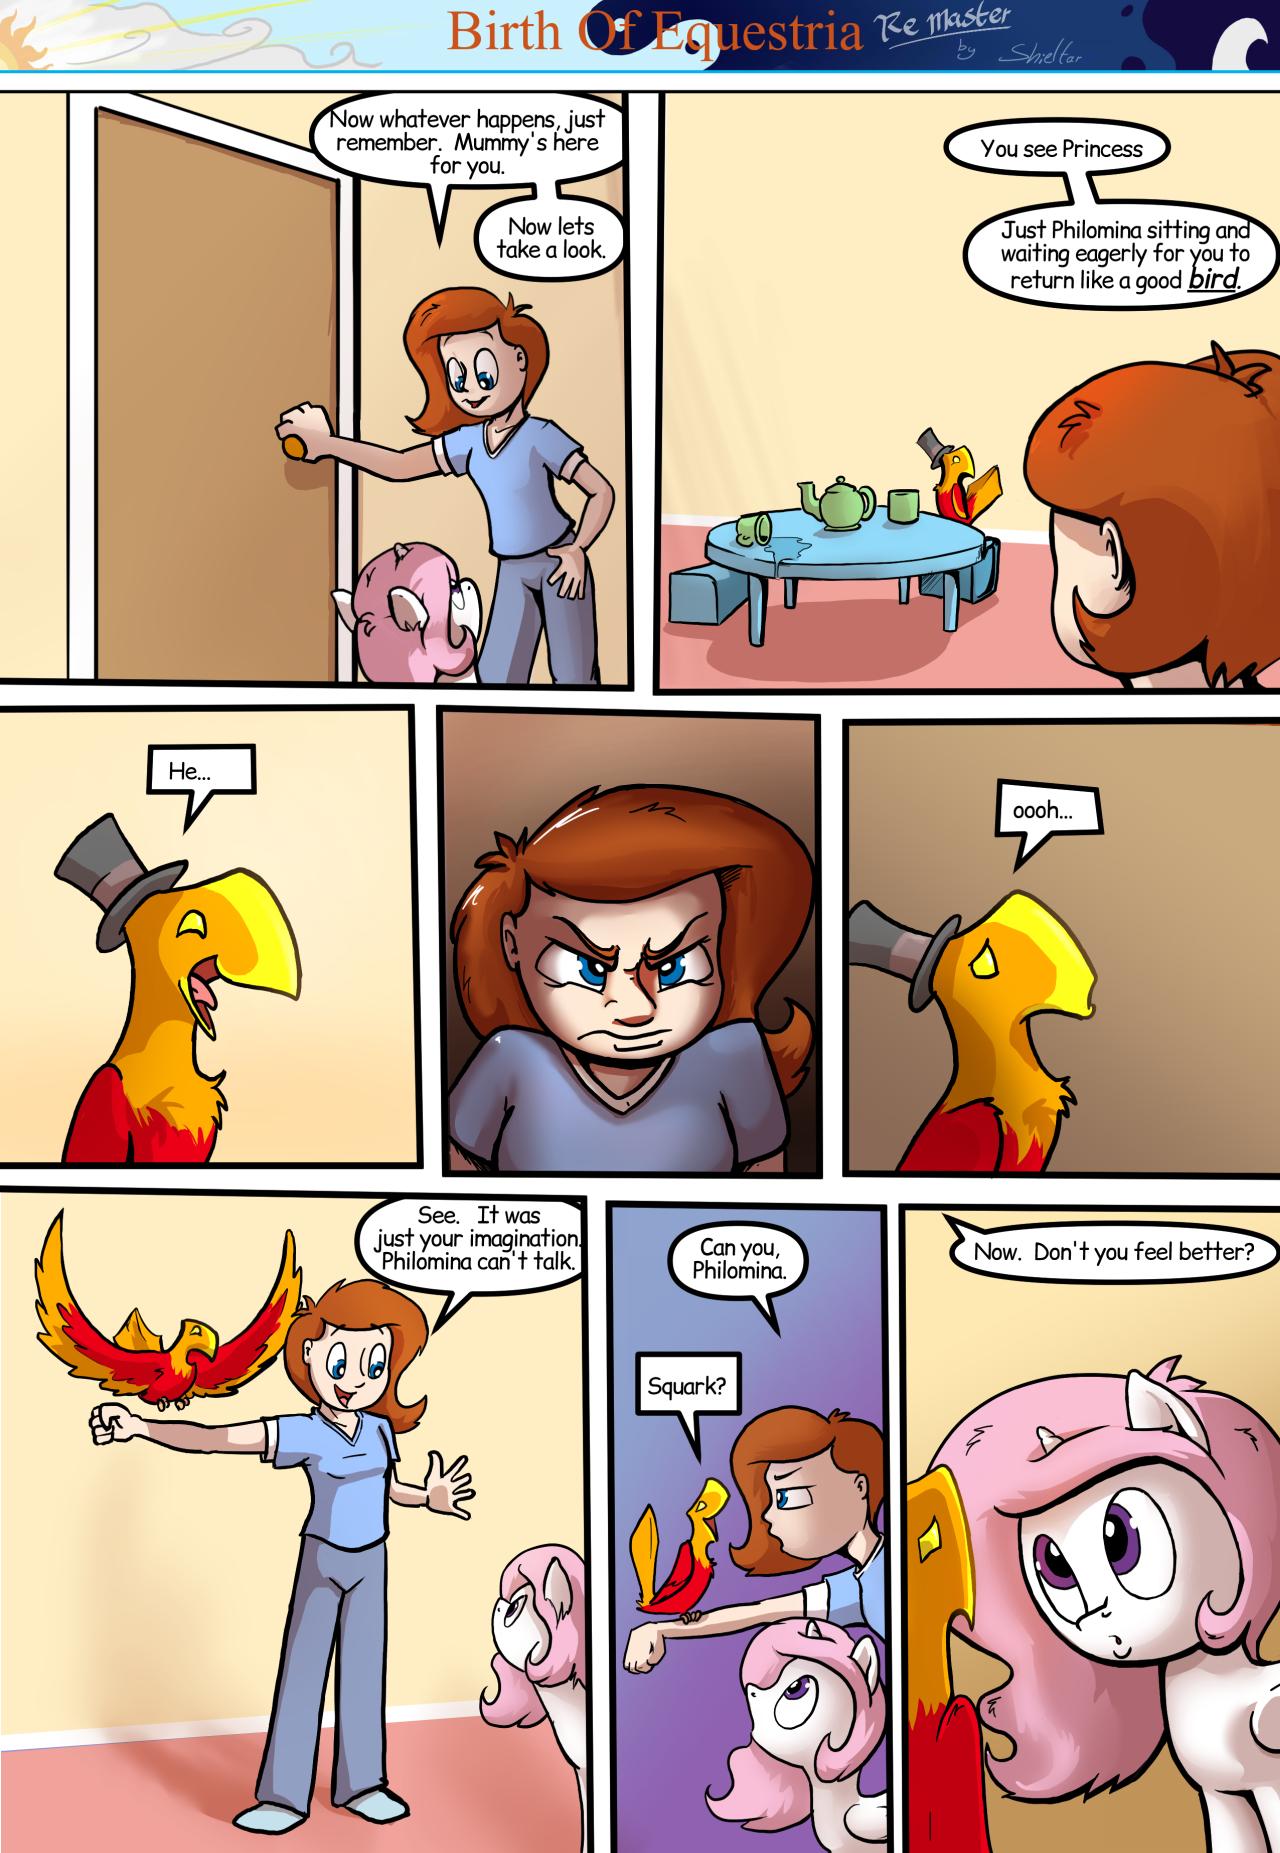 Book 3-31 [remastered] bird done goofed